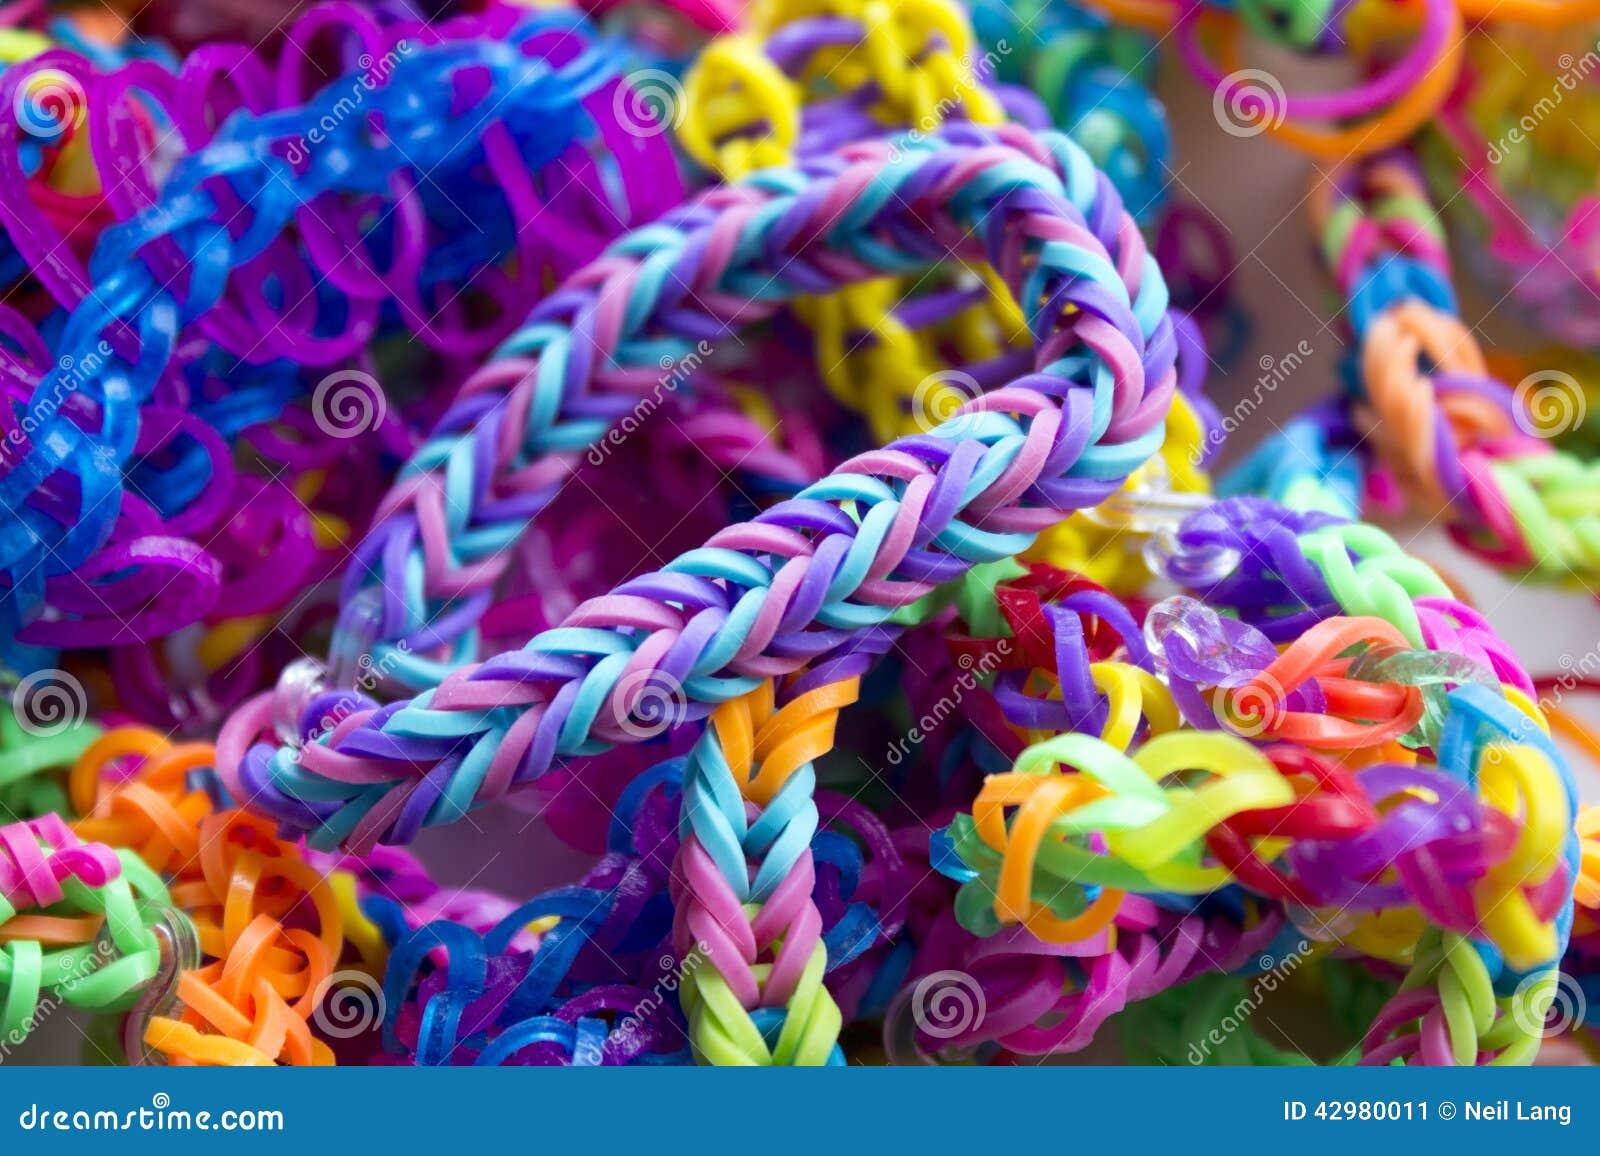 Rubber Band Bracelets Stock Image